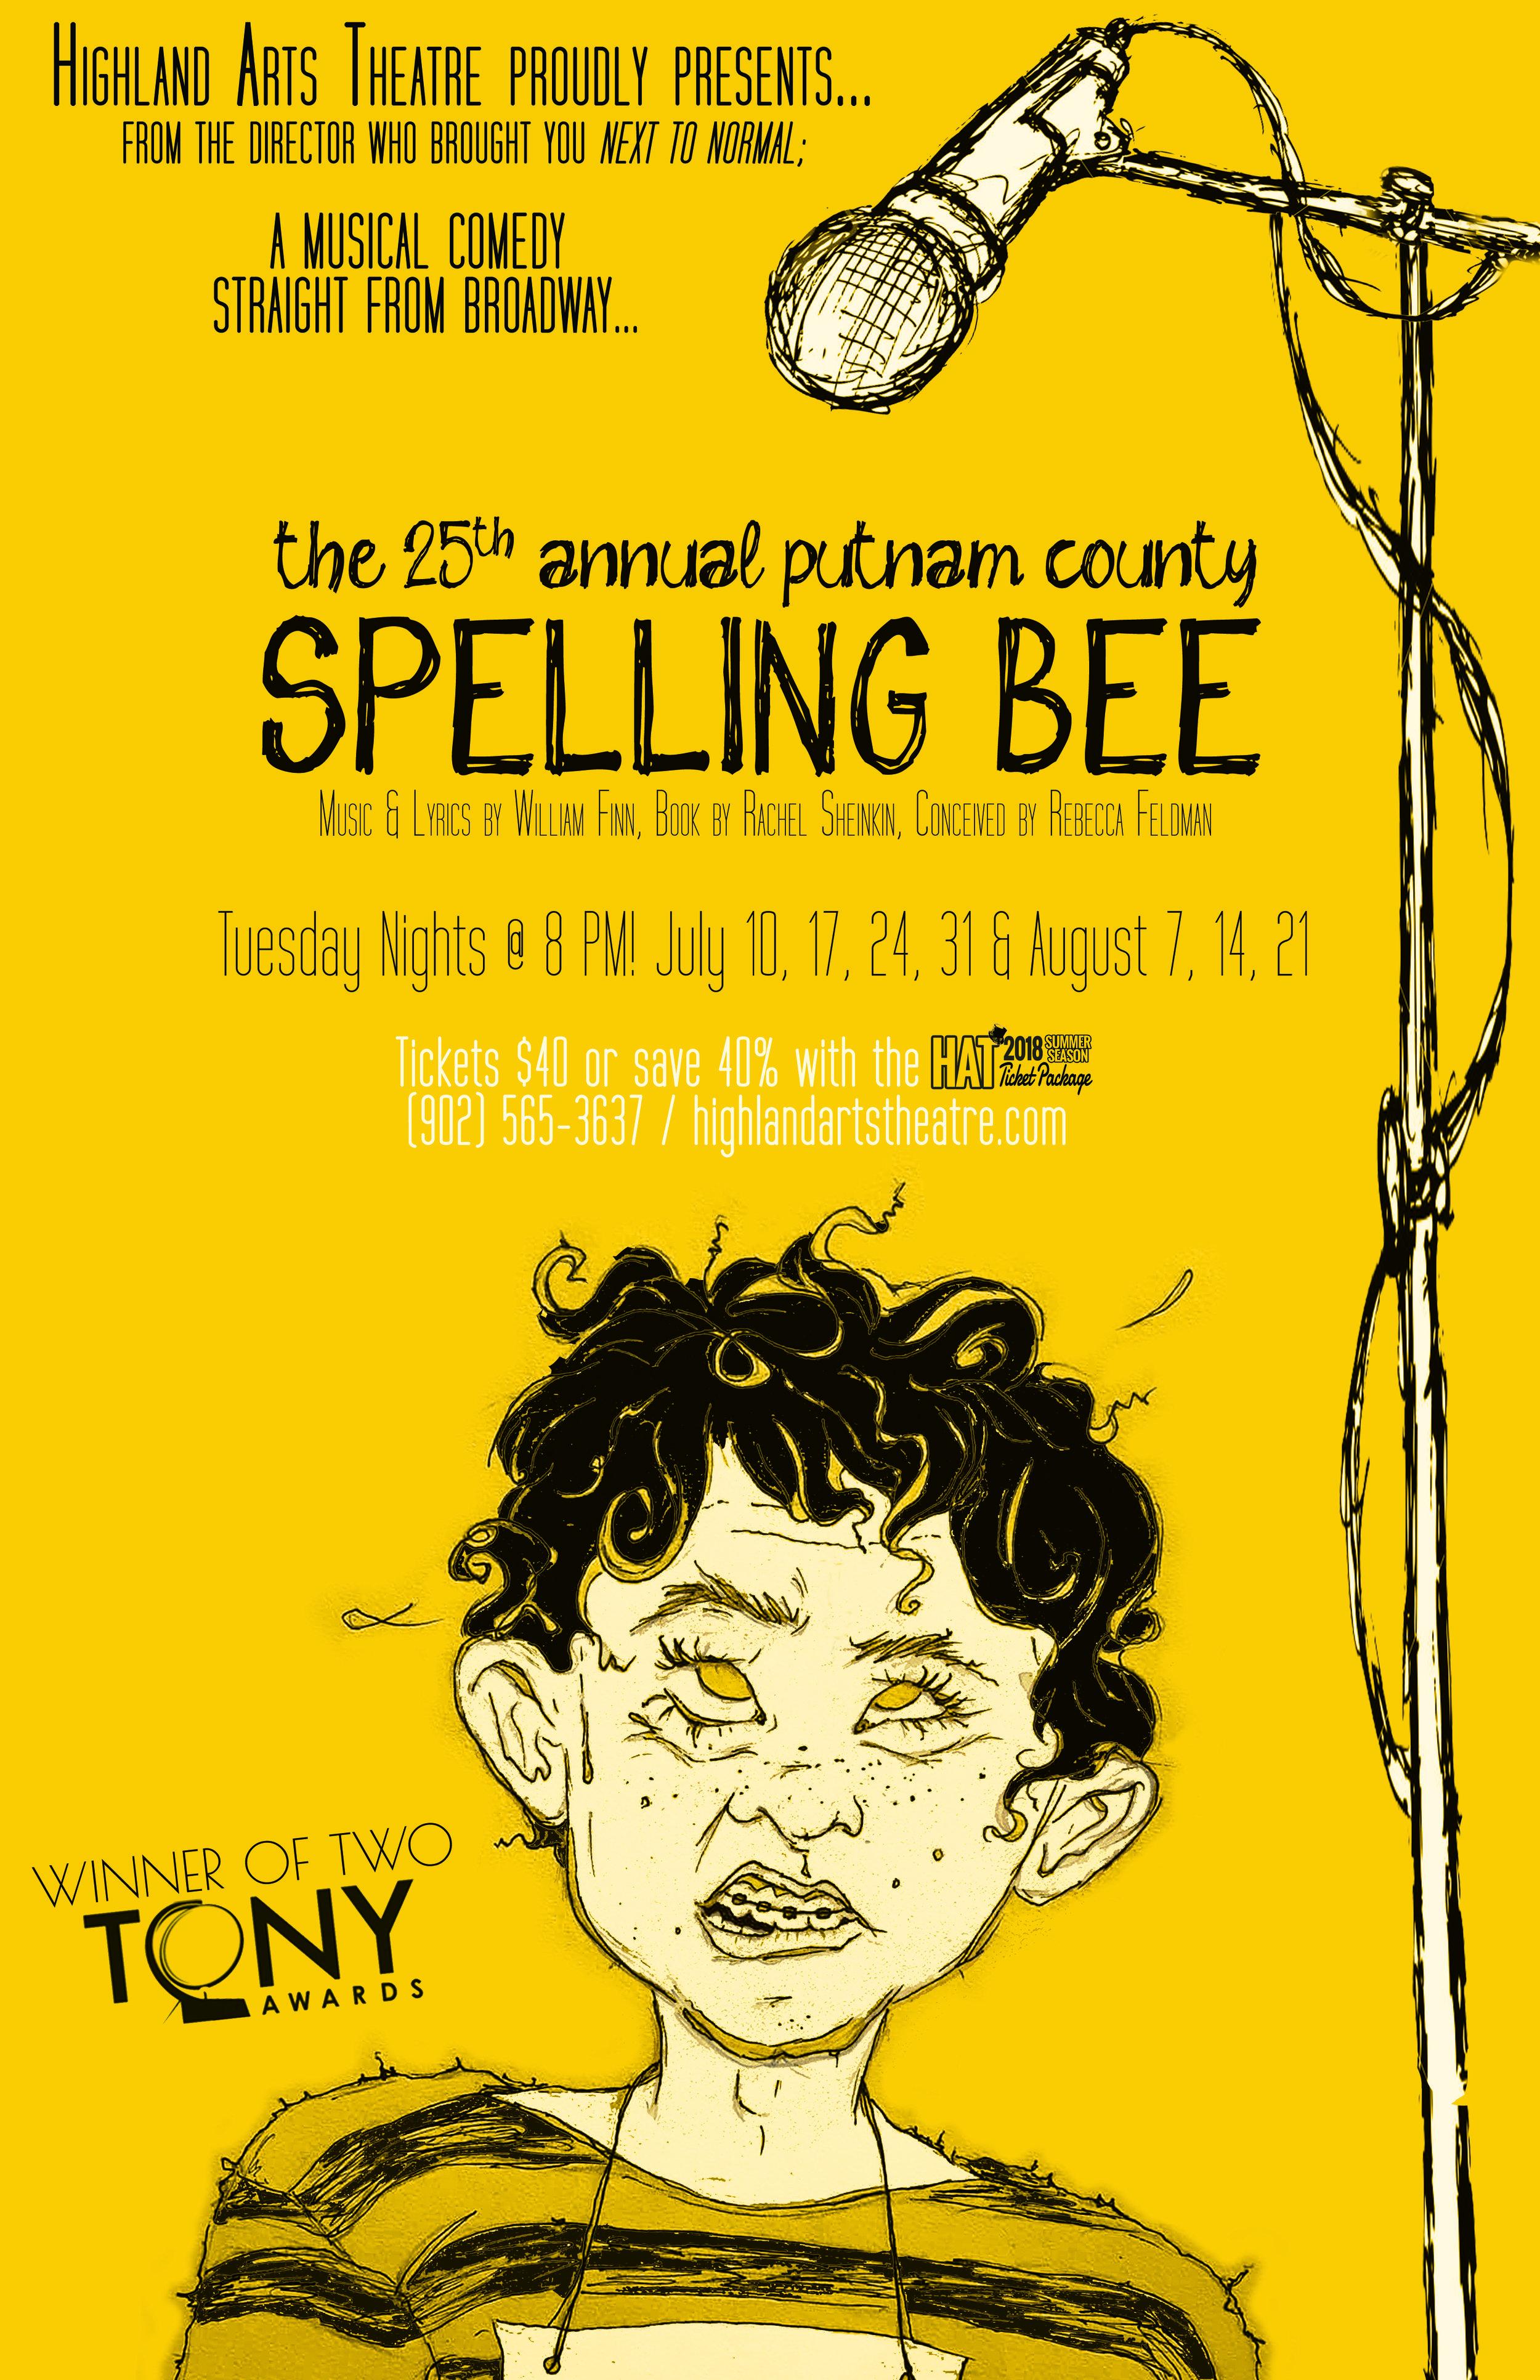 SpellingBee_summer18_POSTER.jpg